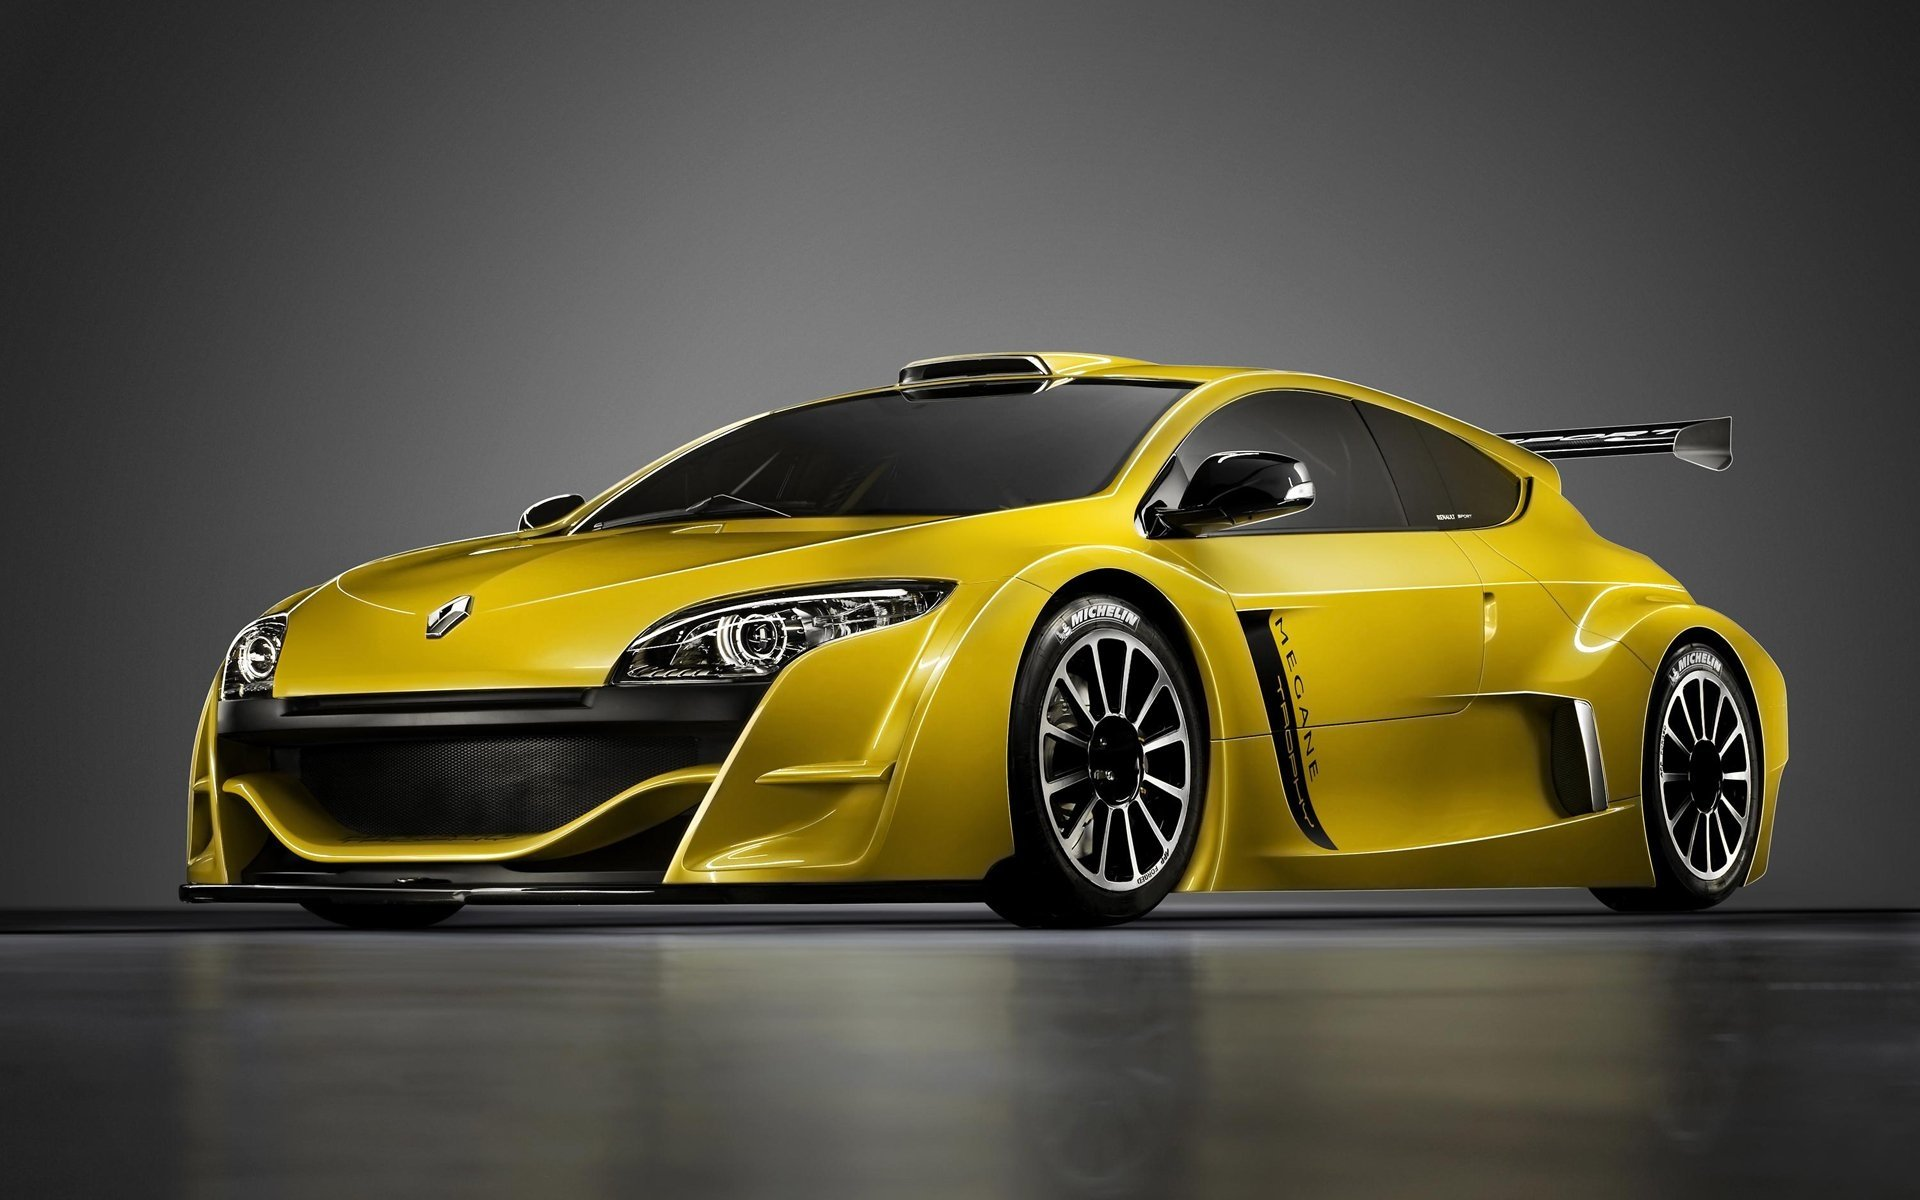 Renault Sport Fond D'écran HD